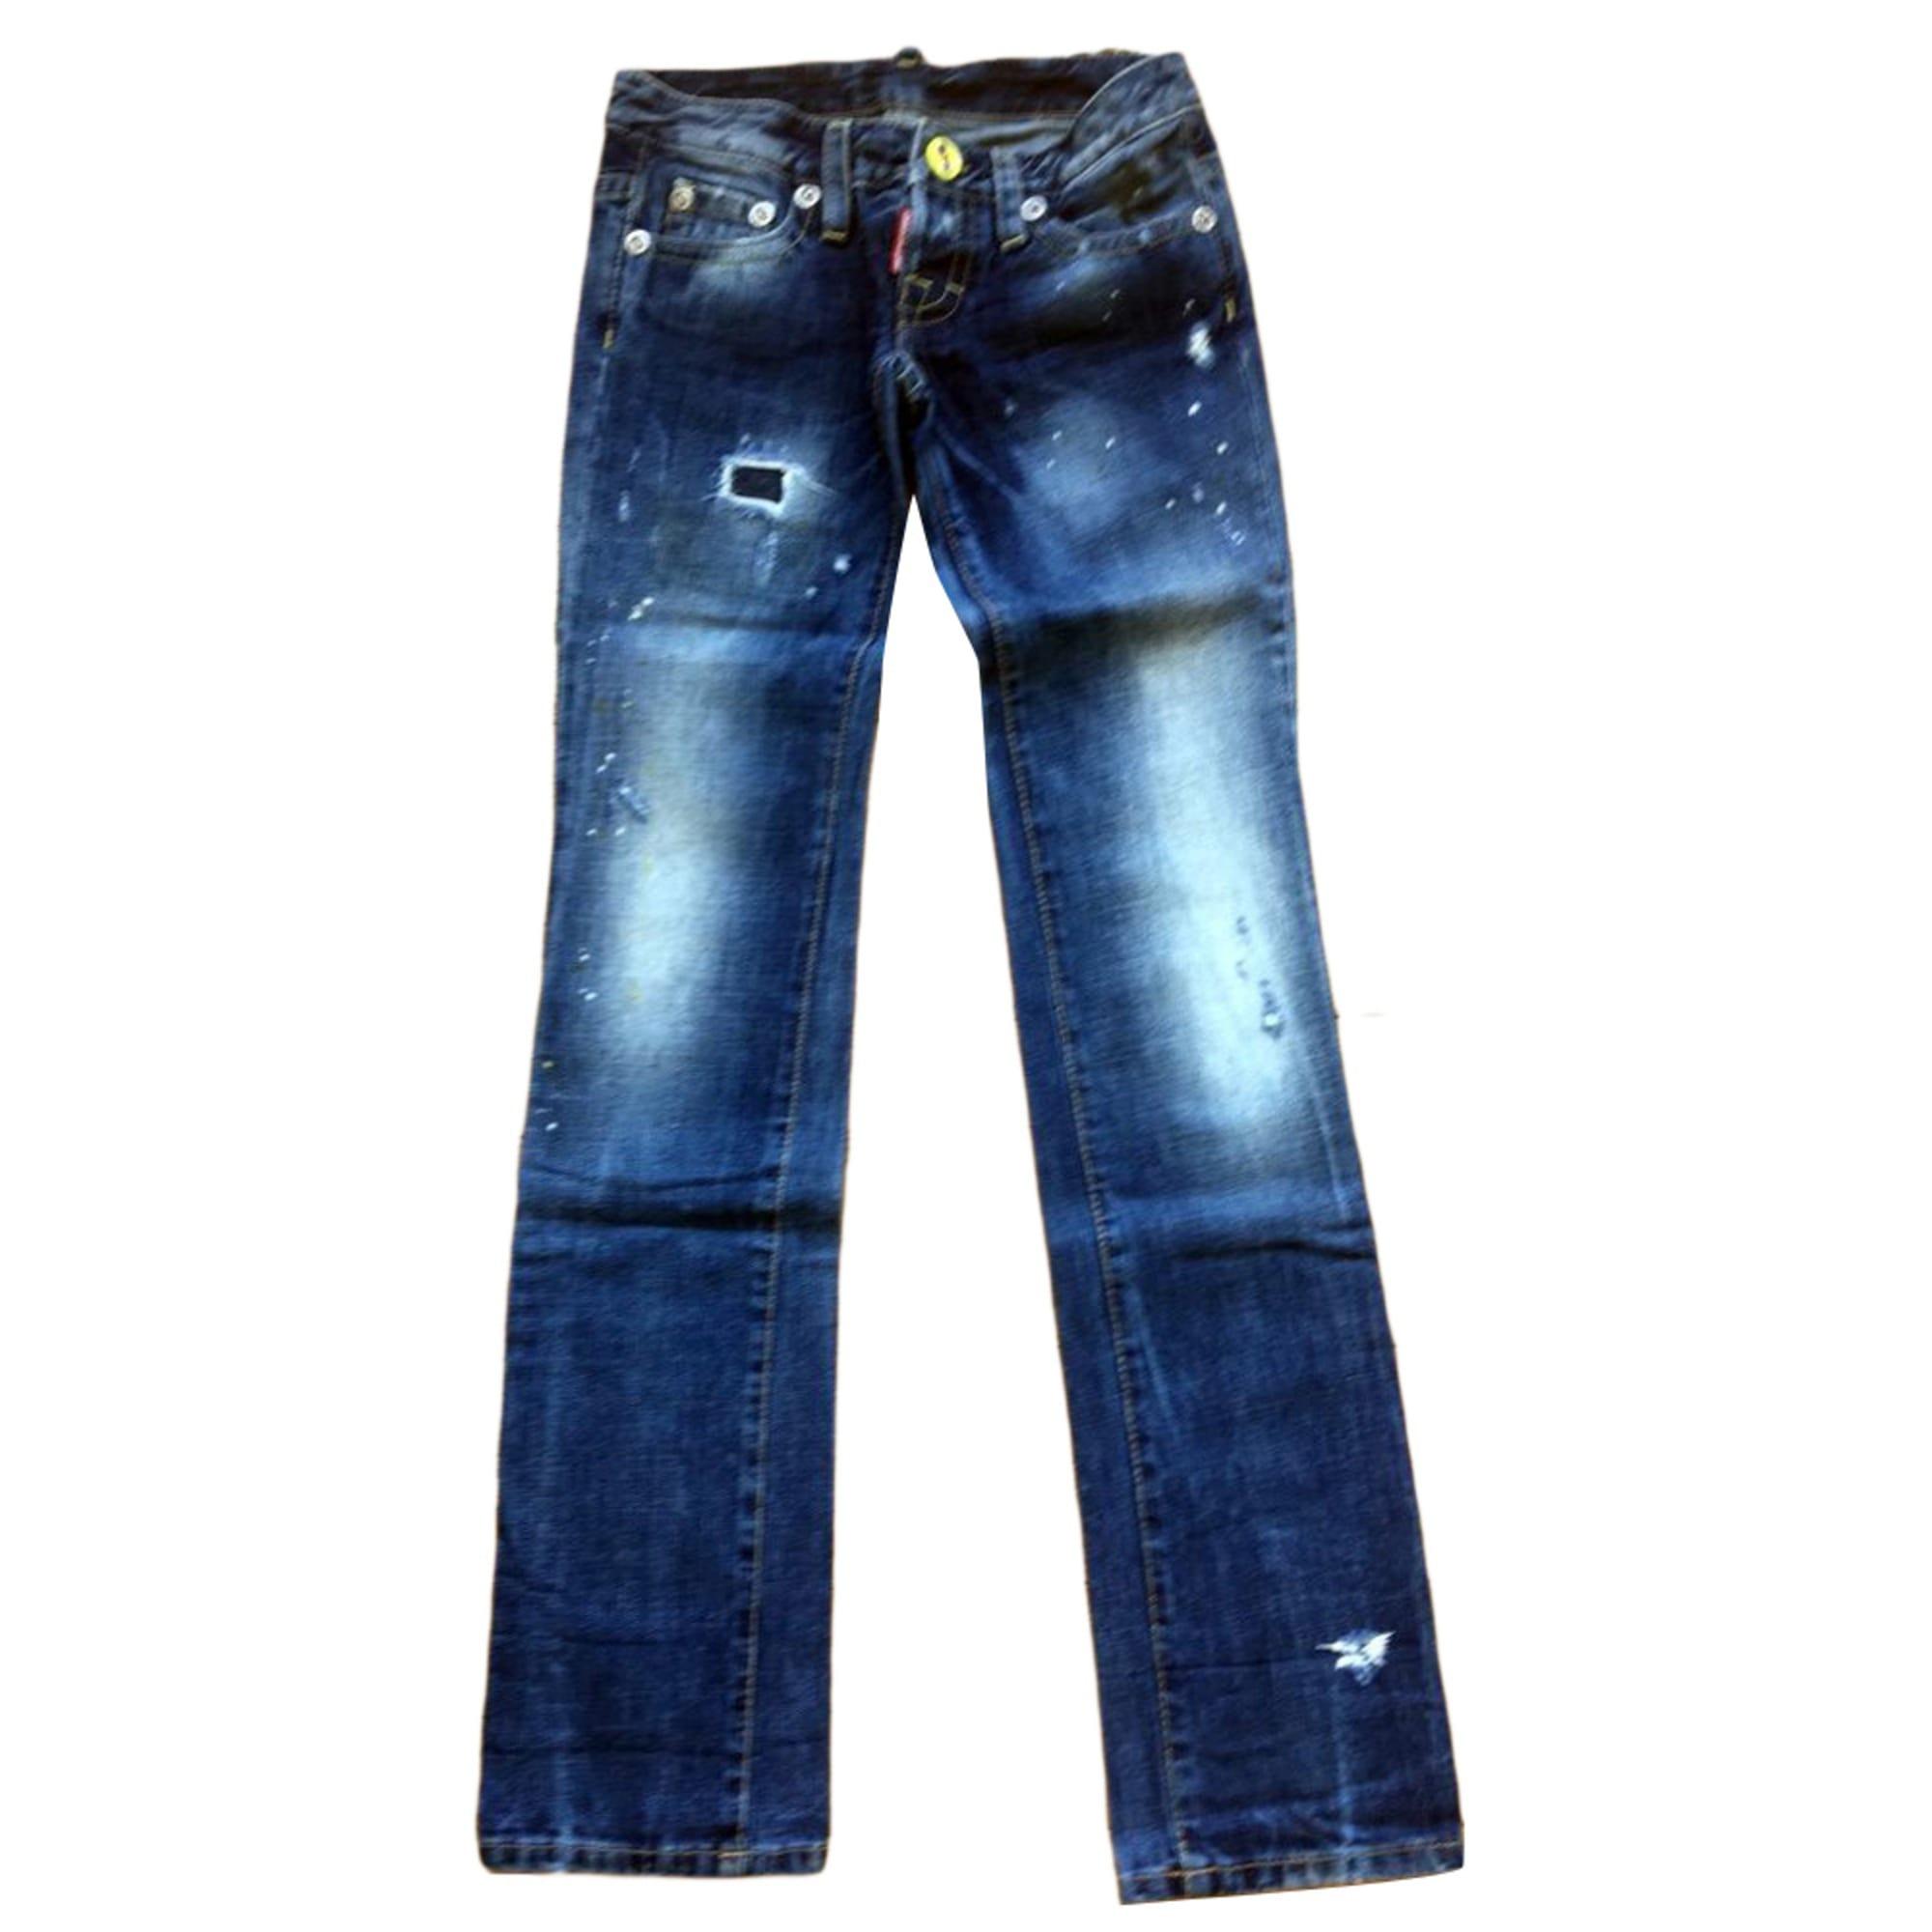 Jeans droit DSQUARED2 Bleu, bleu marine, bleu turquoise 3ec77803762